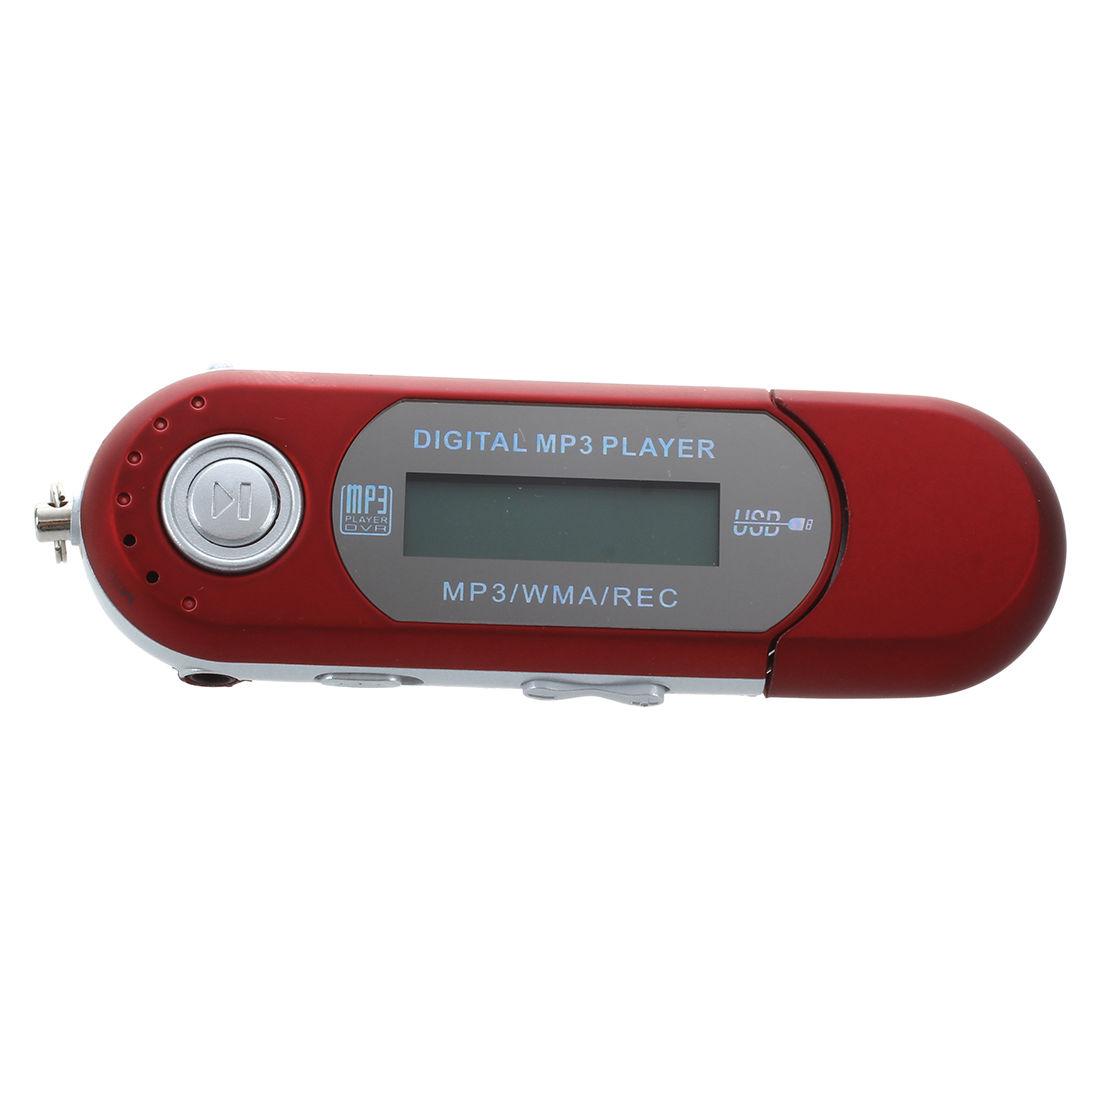 8g usb flash drive mp3 player fm walkman red sdt. Black Bedroom Furniture Sets. Home Design Ideas